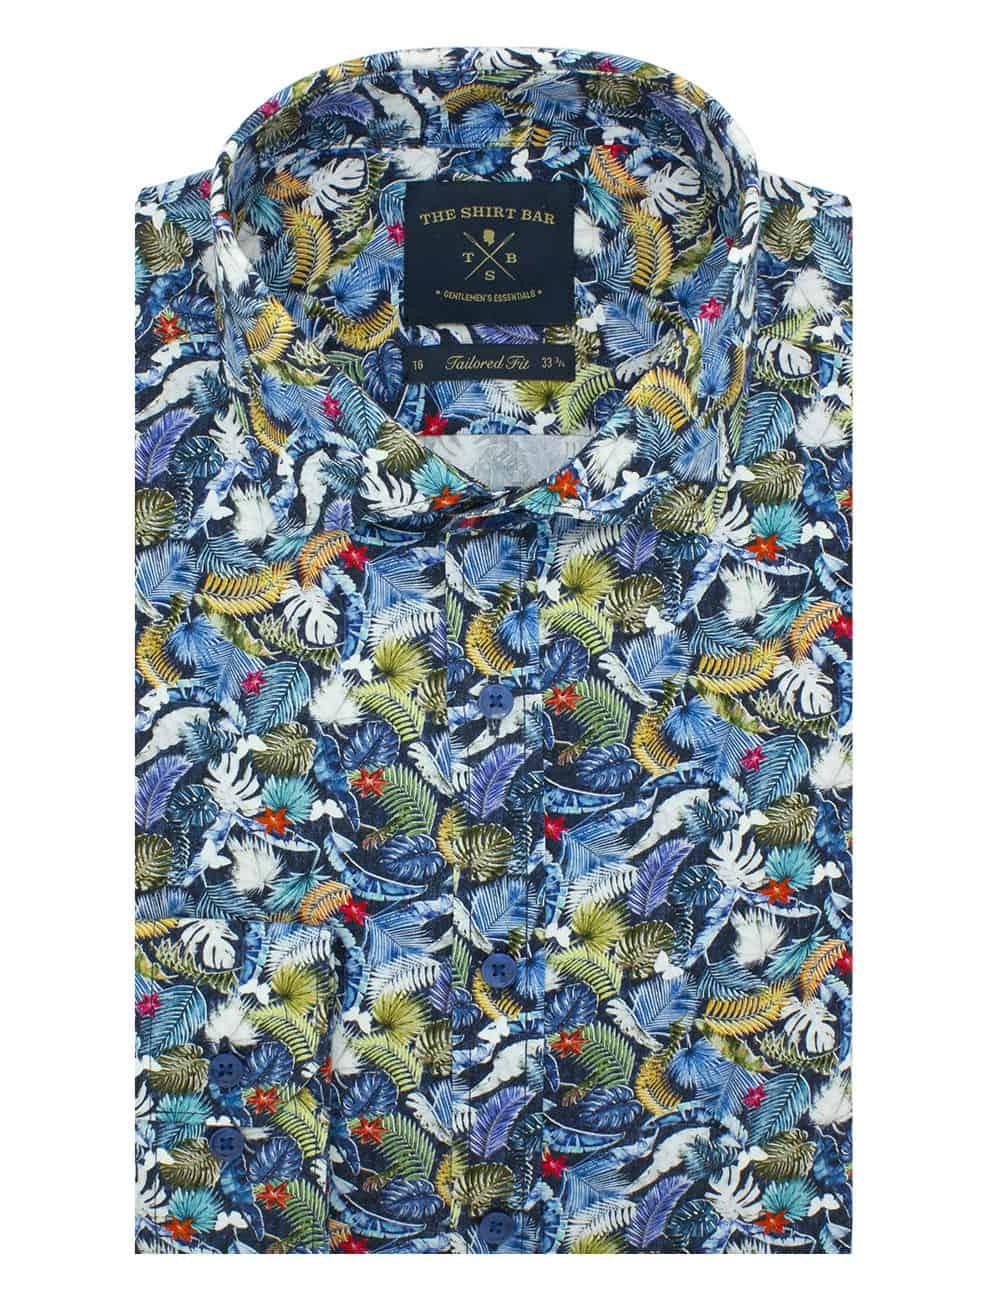 Tailored Fit Premium Italian Fabric Long Sleeve Single Cuff Men's Shirt (Digitally Printed)